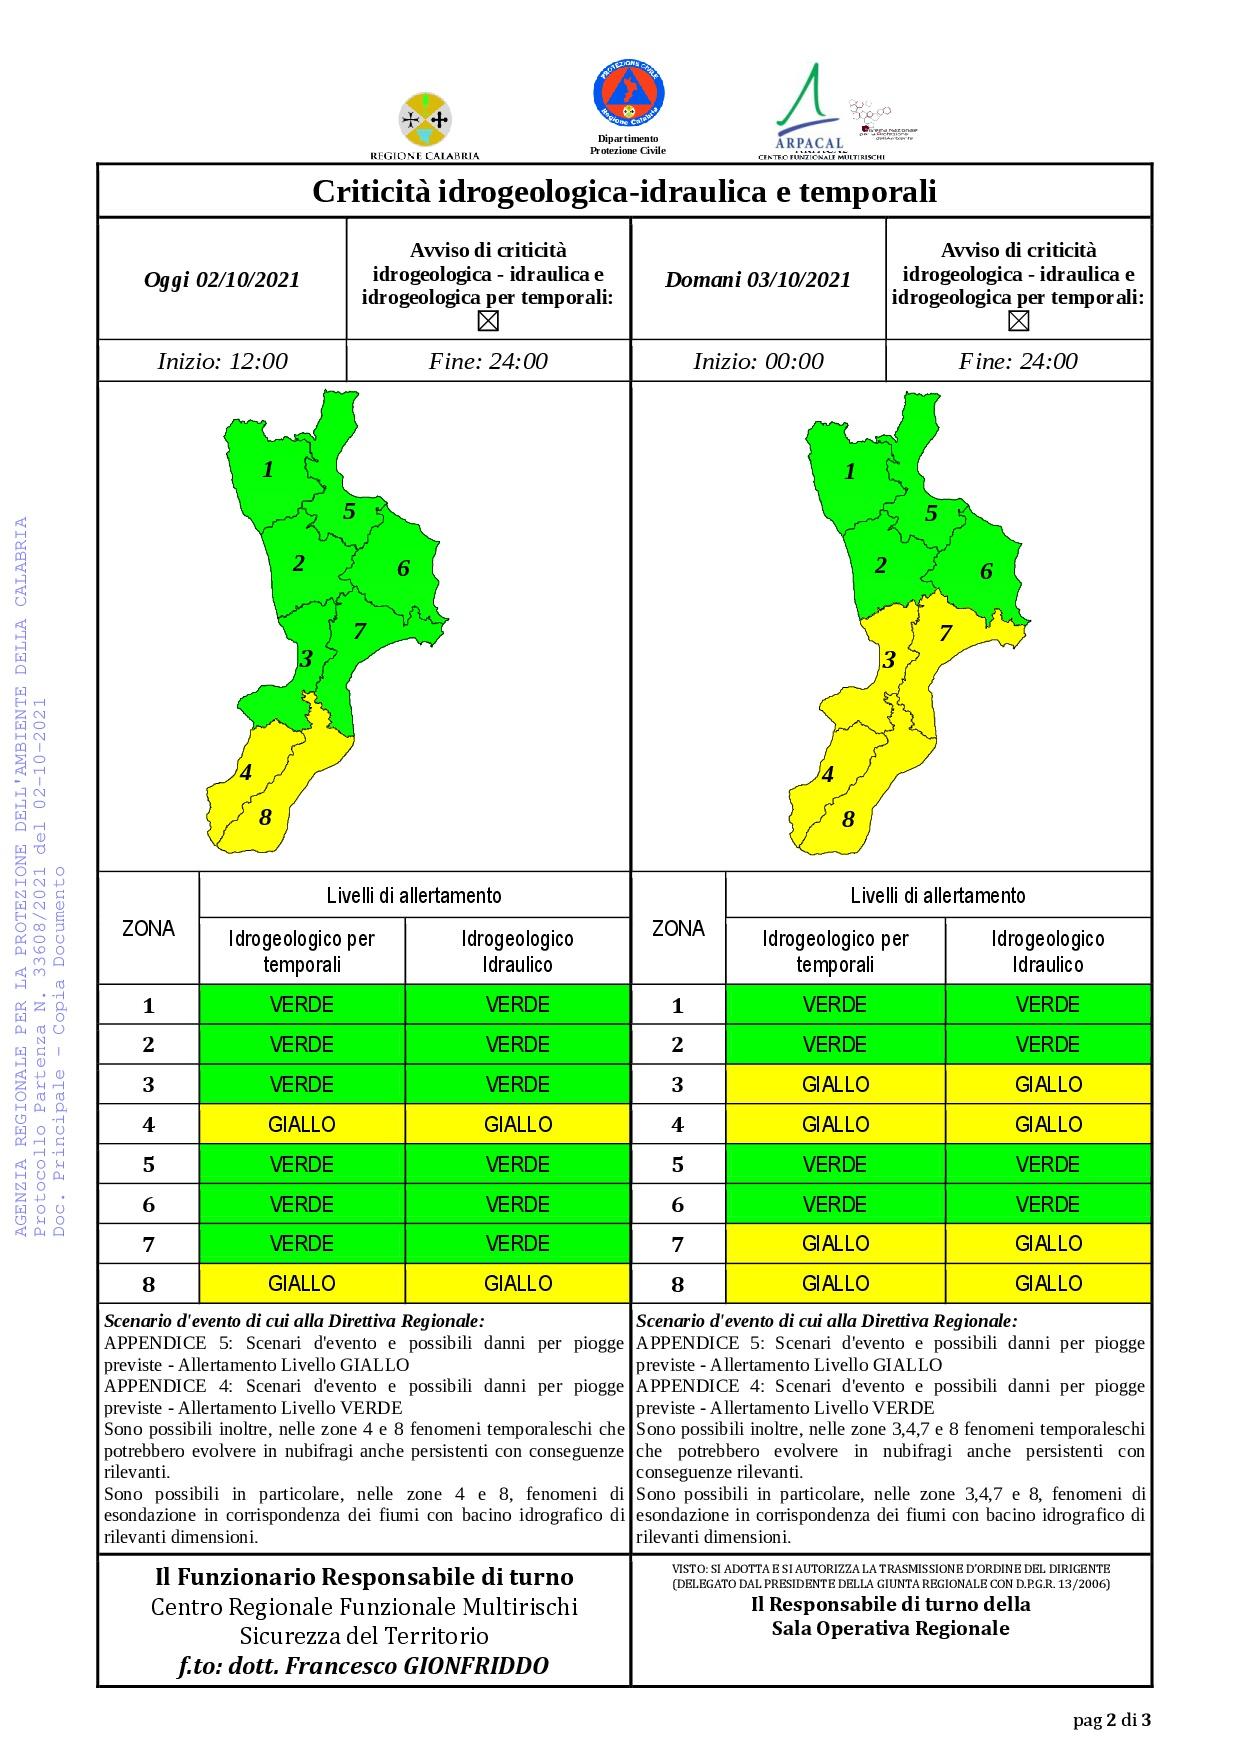 Criticità idrogeologica-idraulica e temporali in Calabria 02-10-2021